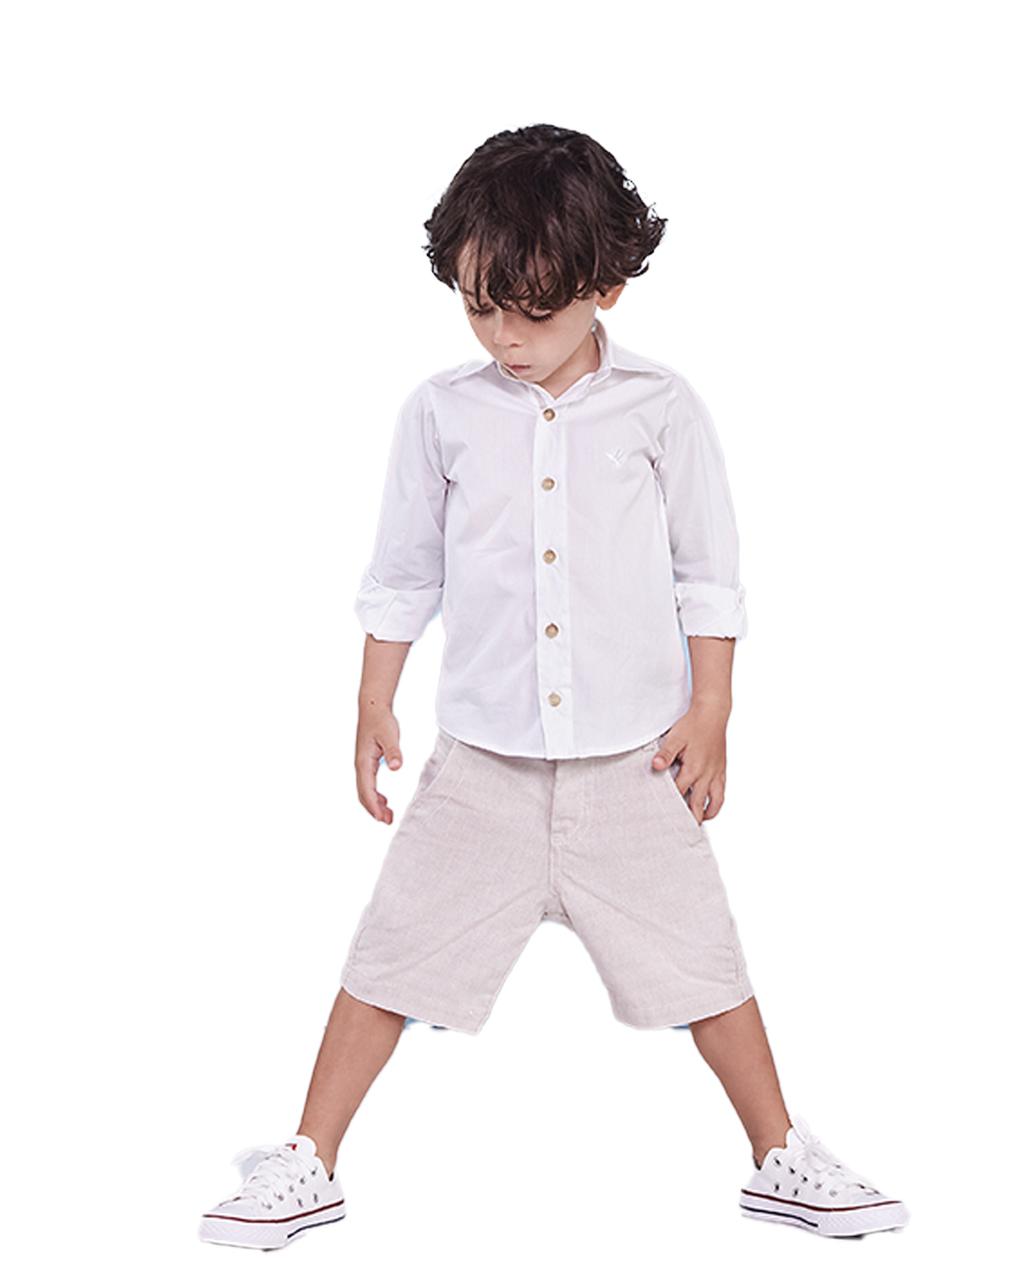 Conjunto Infantil Camisa Branca com Bermuda Social Caqui Precoce